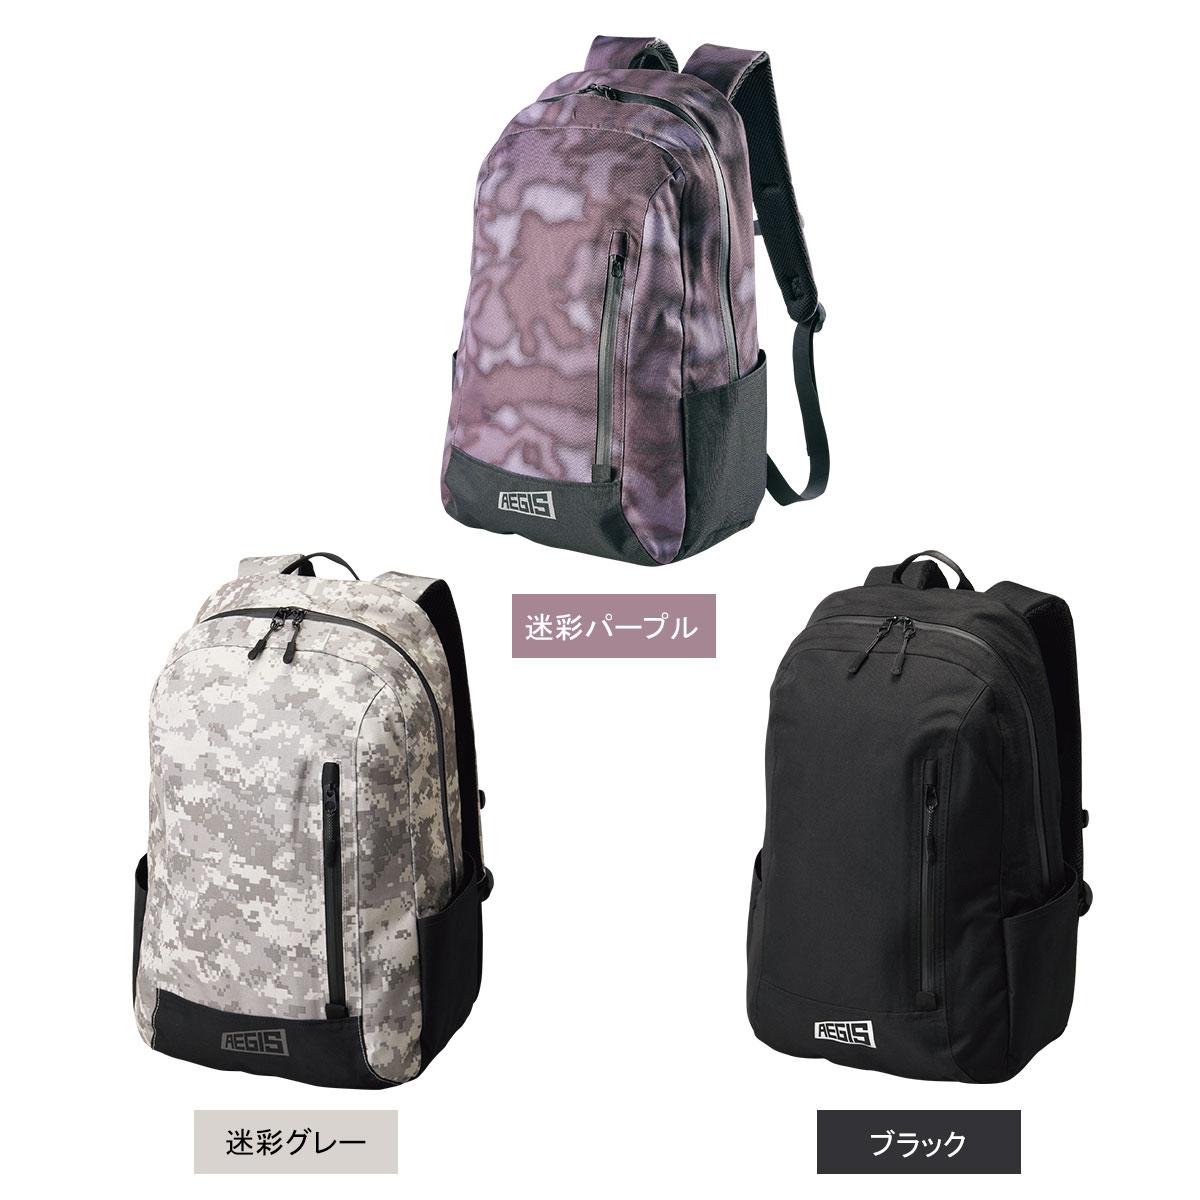 f:id:yamada0221:20200129105737j:plain